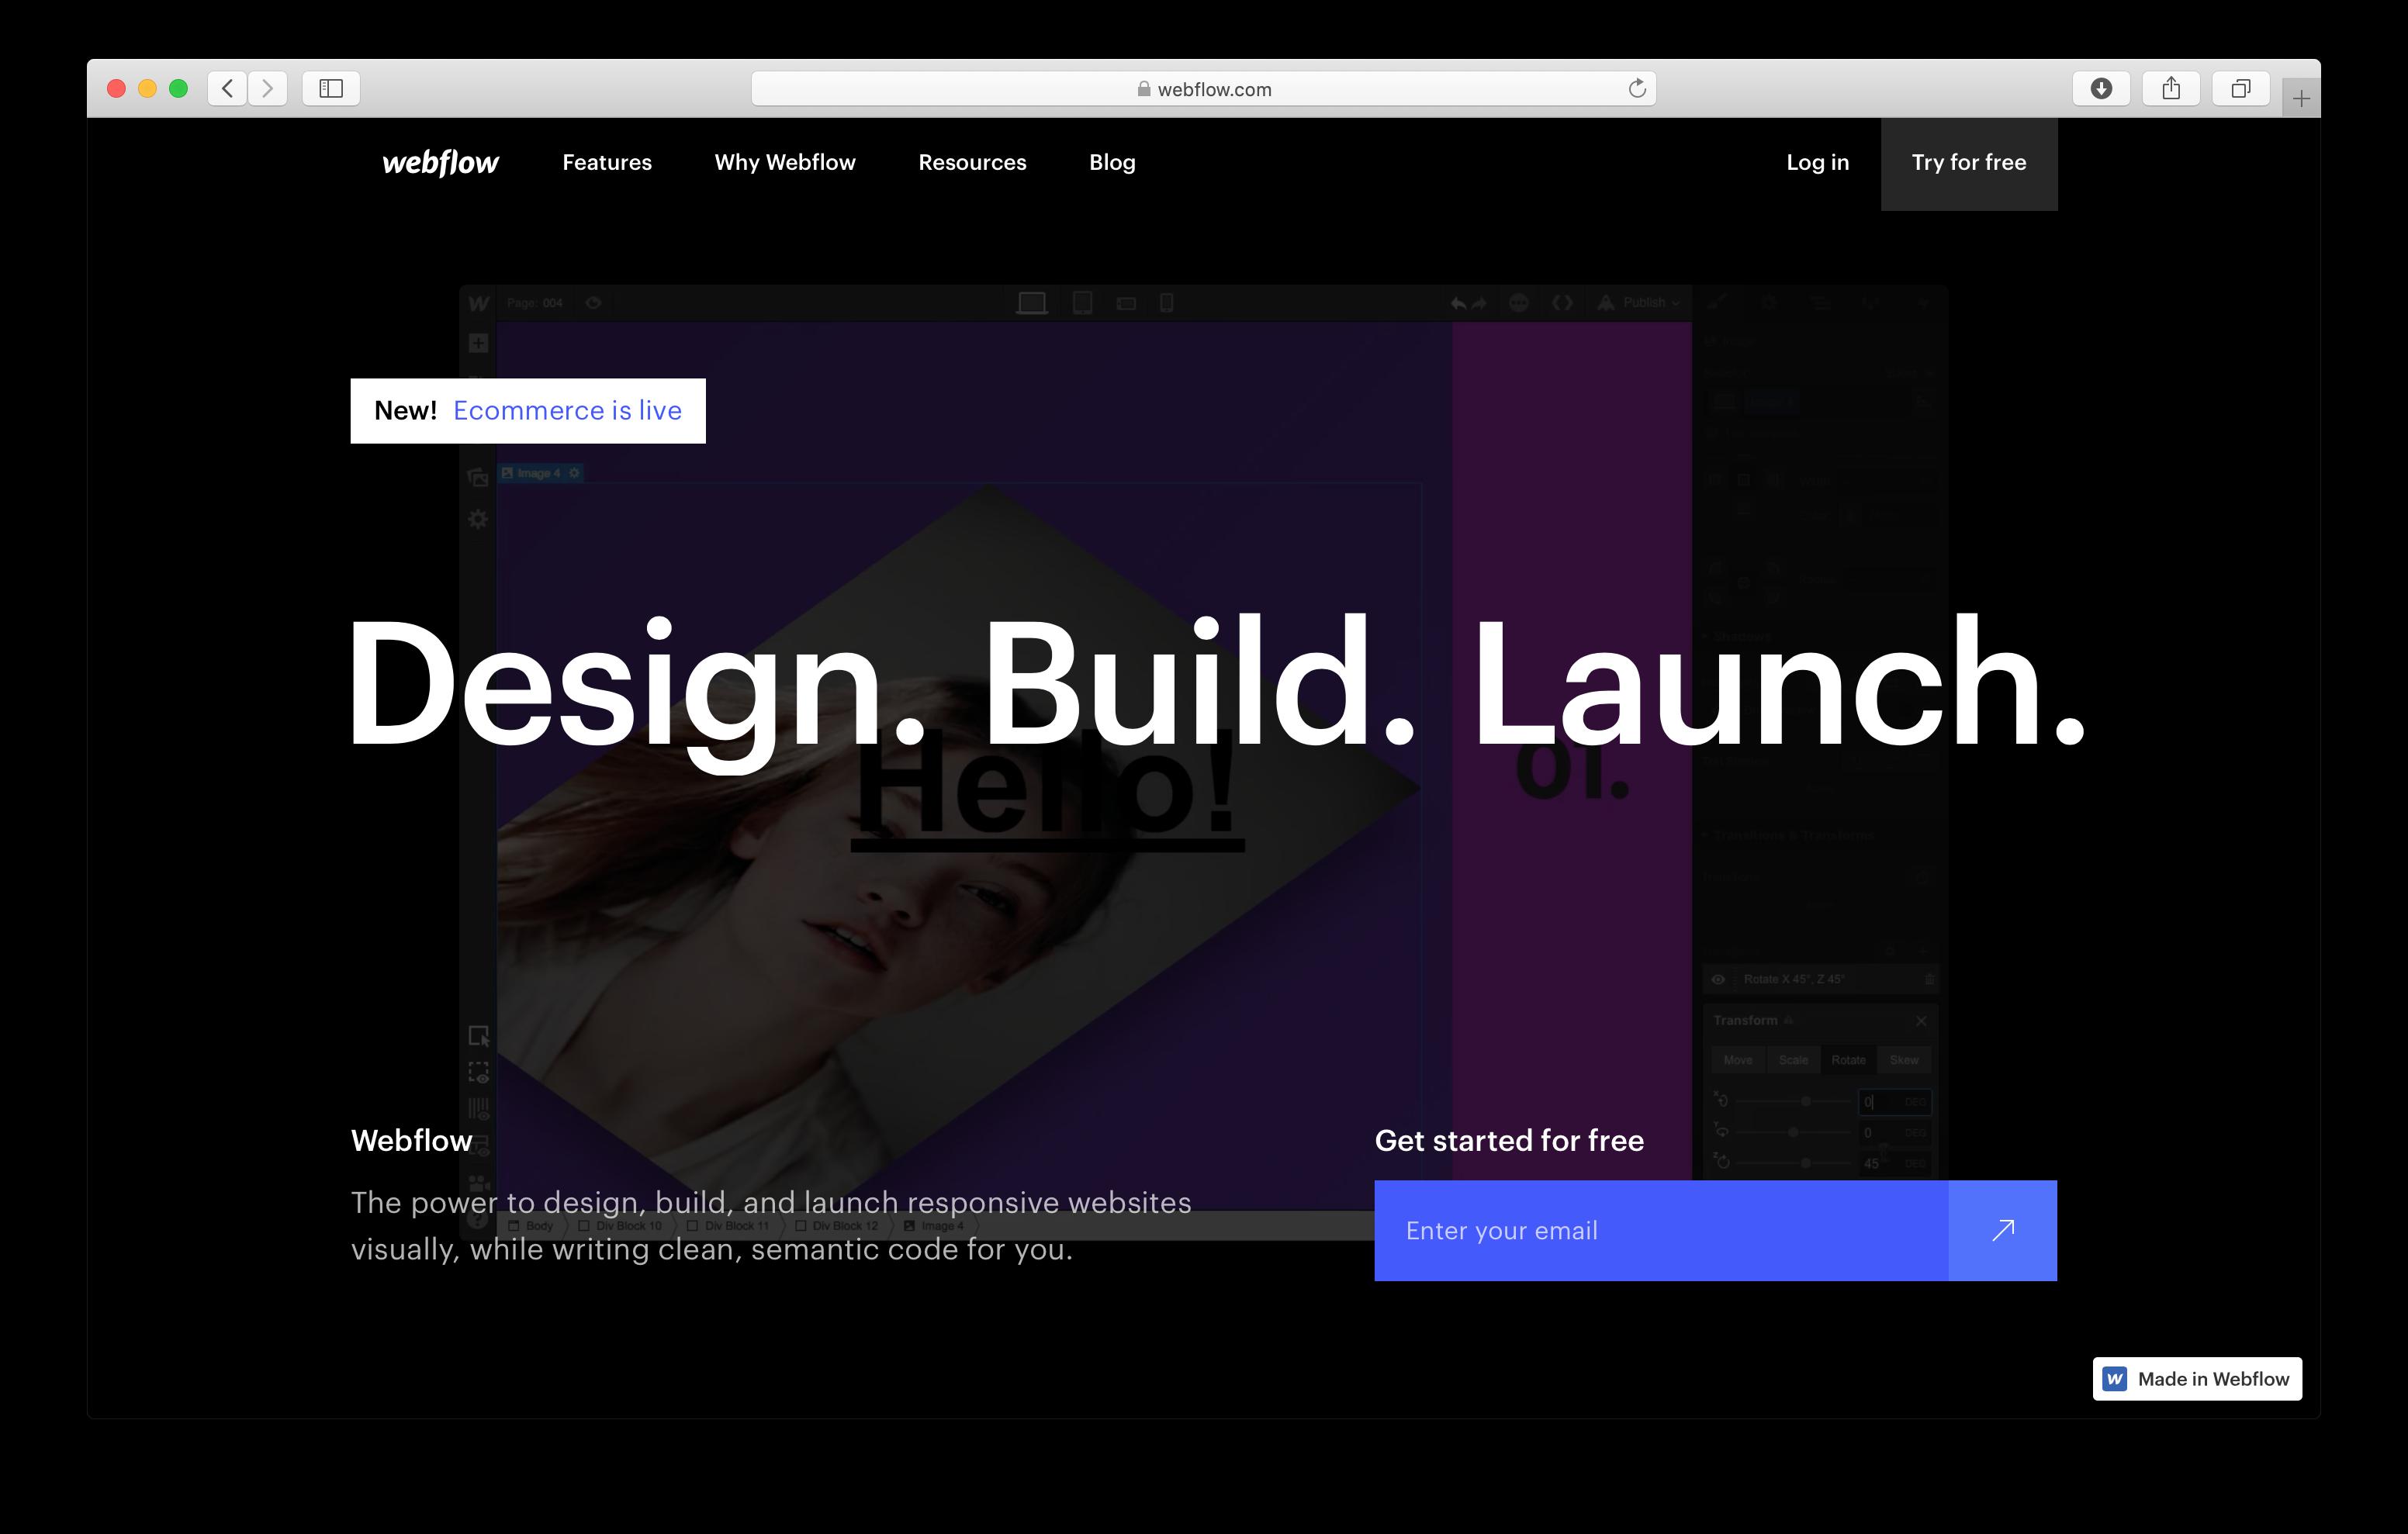 Screenshot of the Webflow website